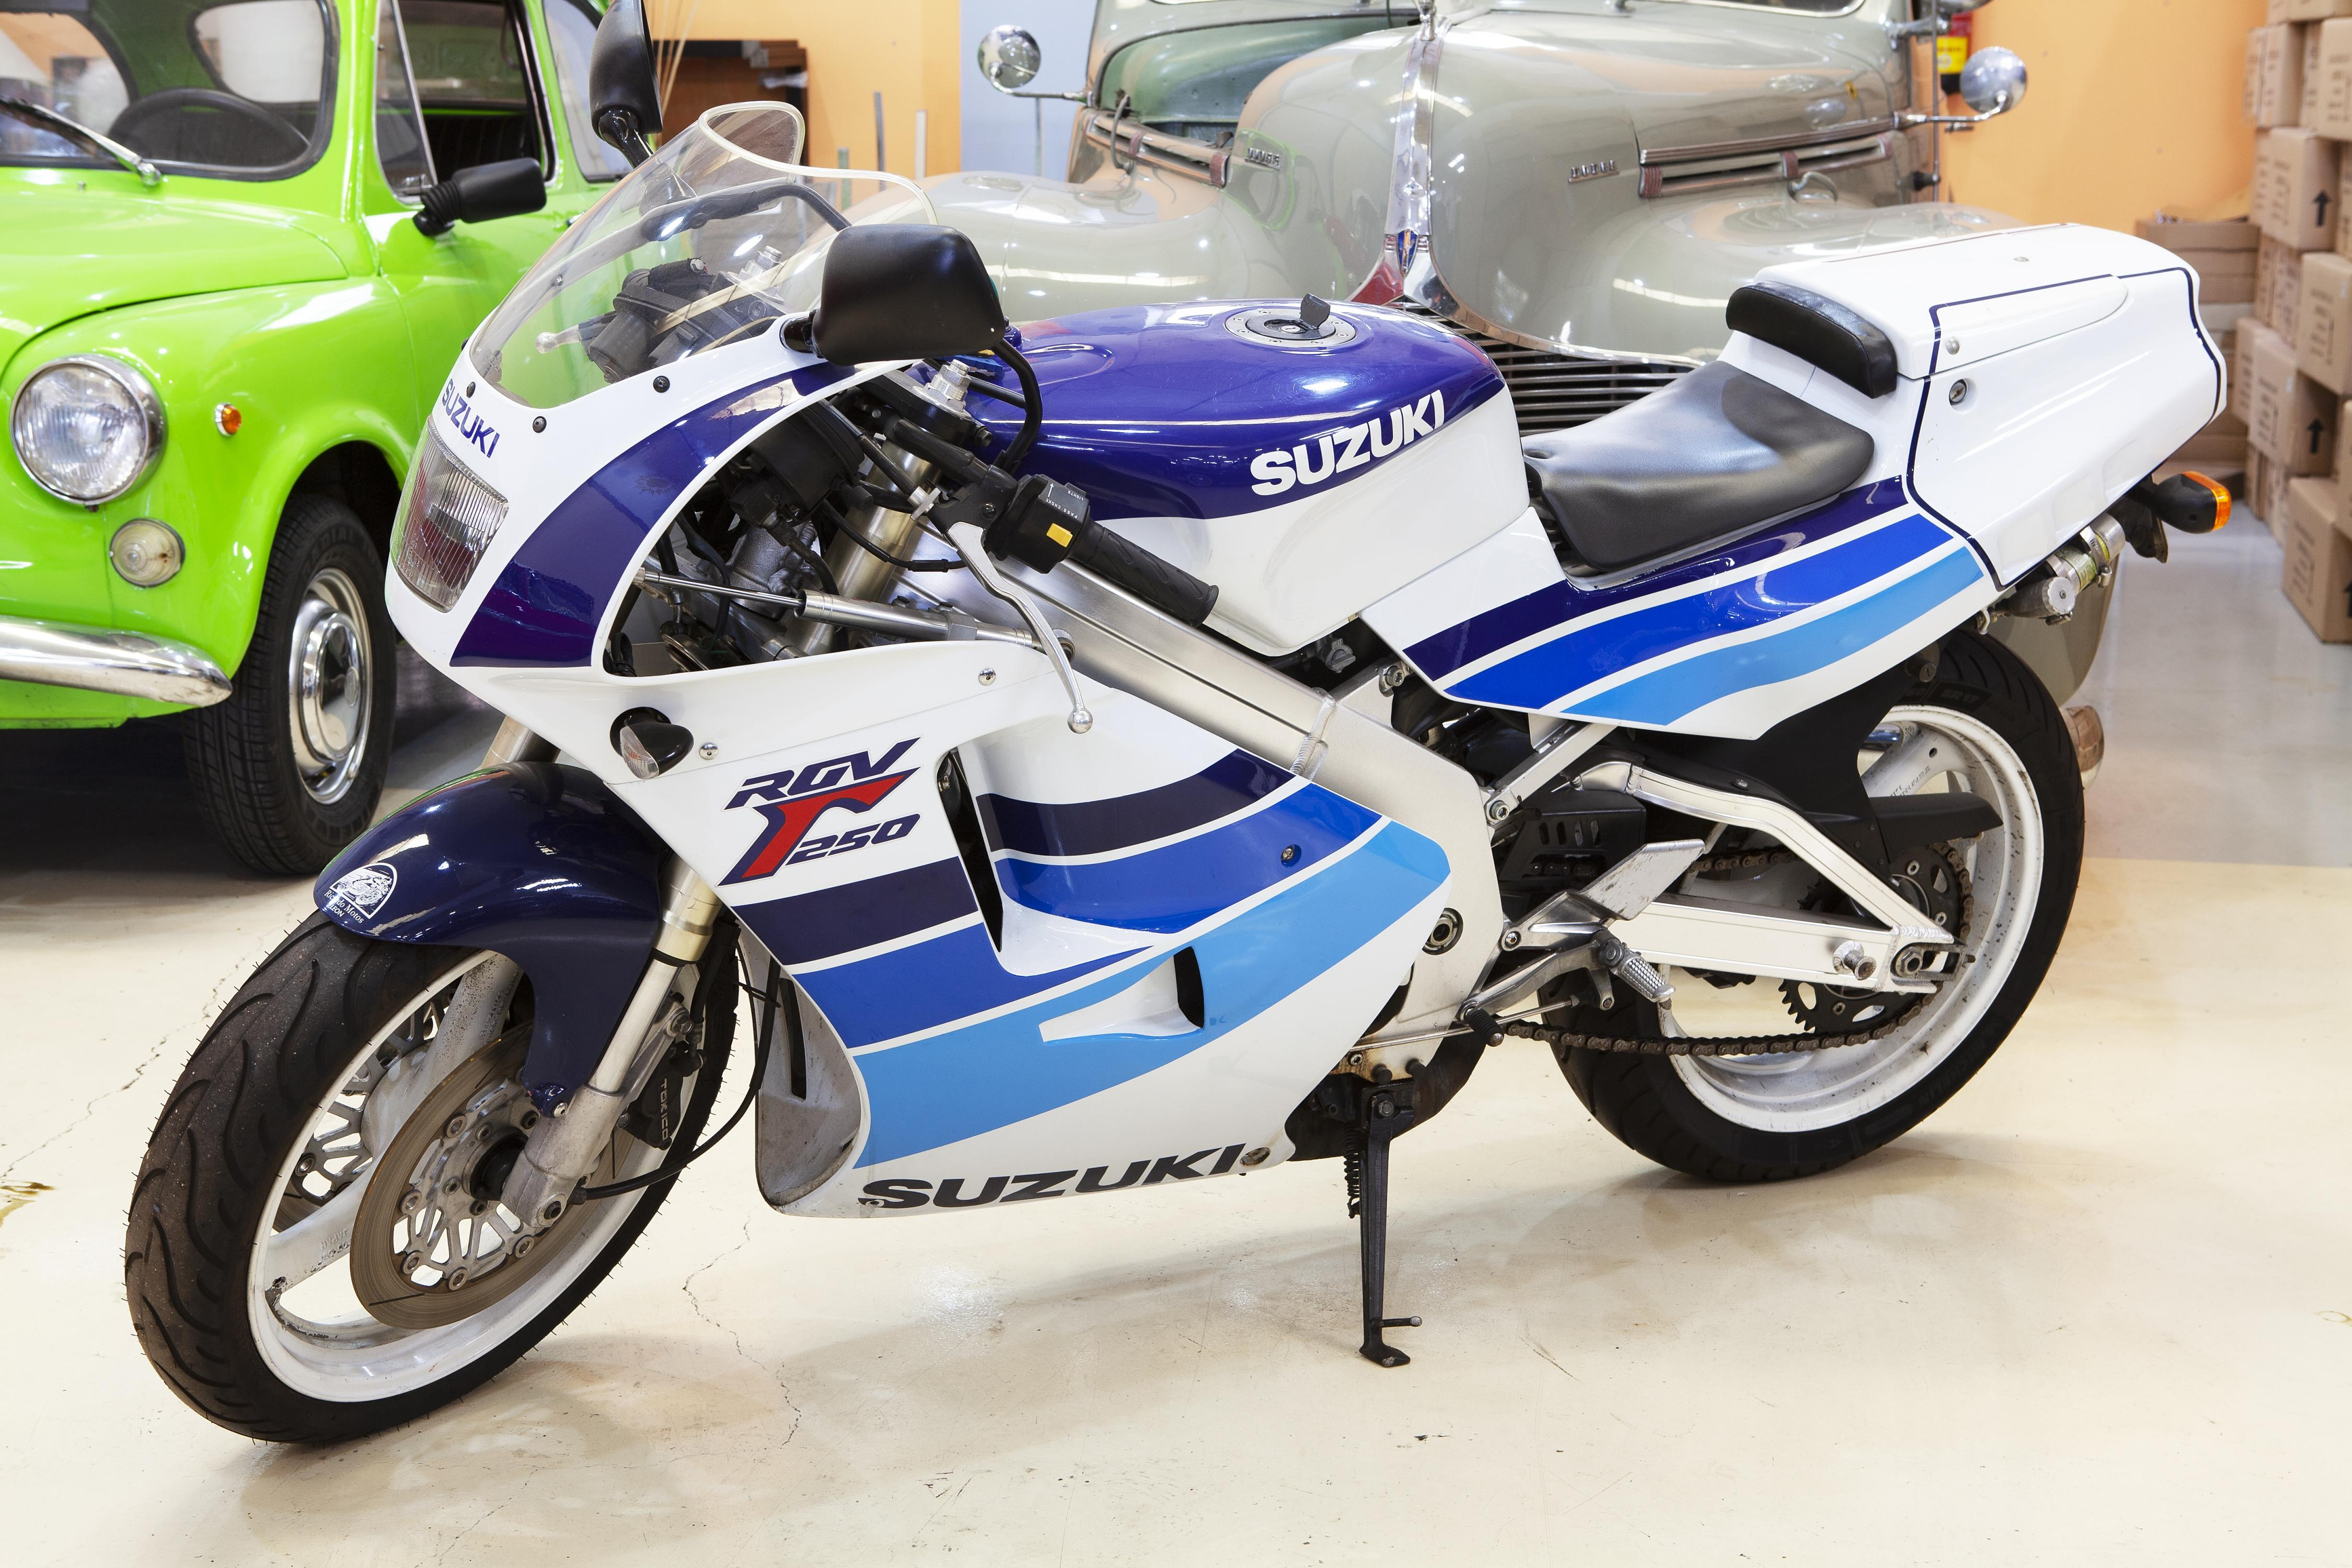 SUZUKI RGV 250 2T